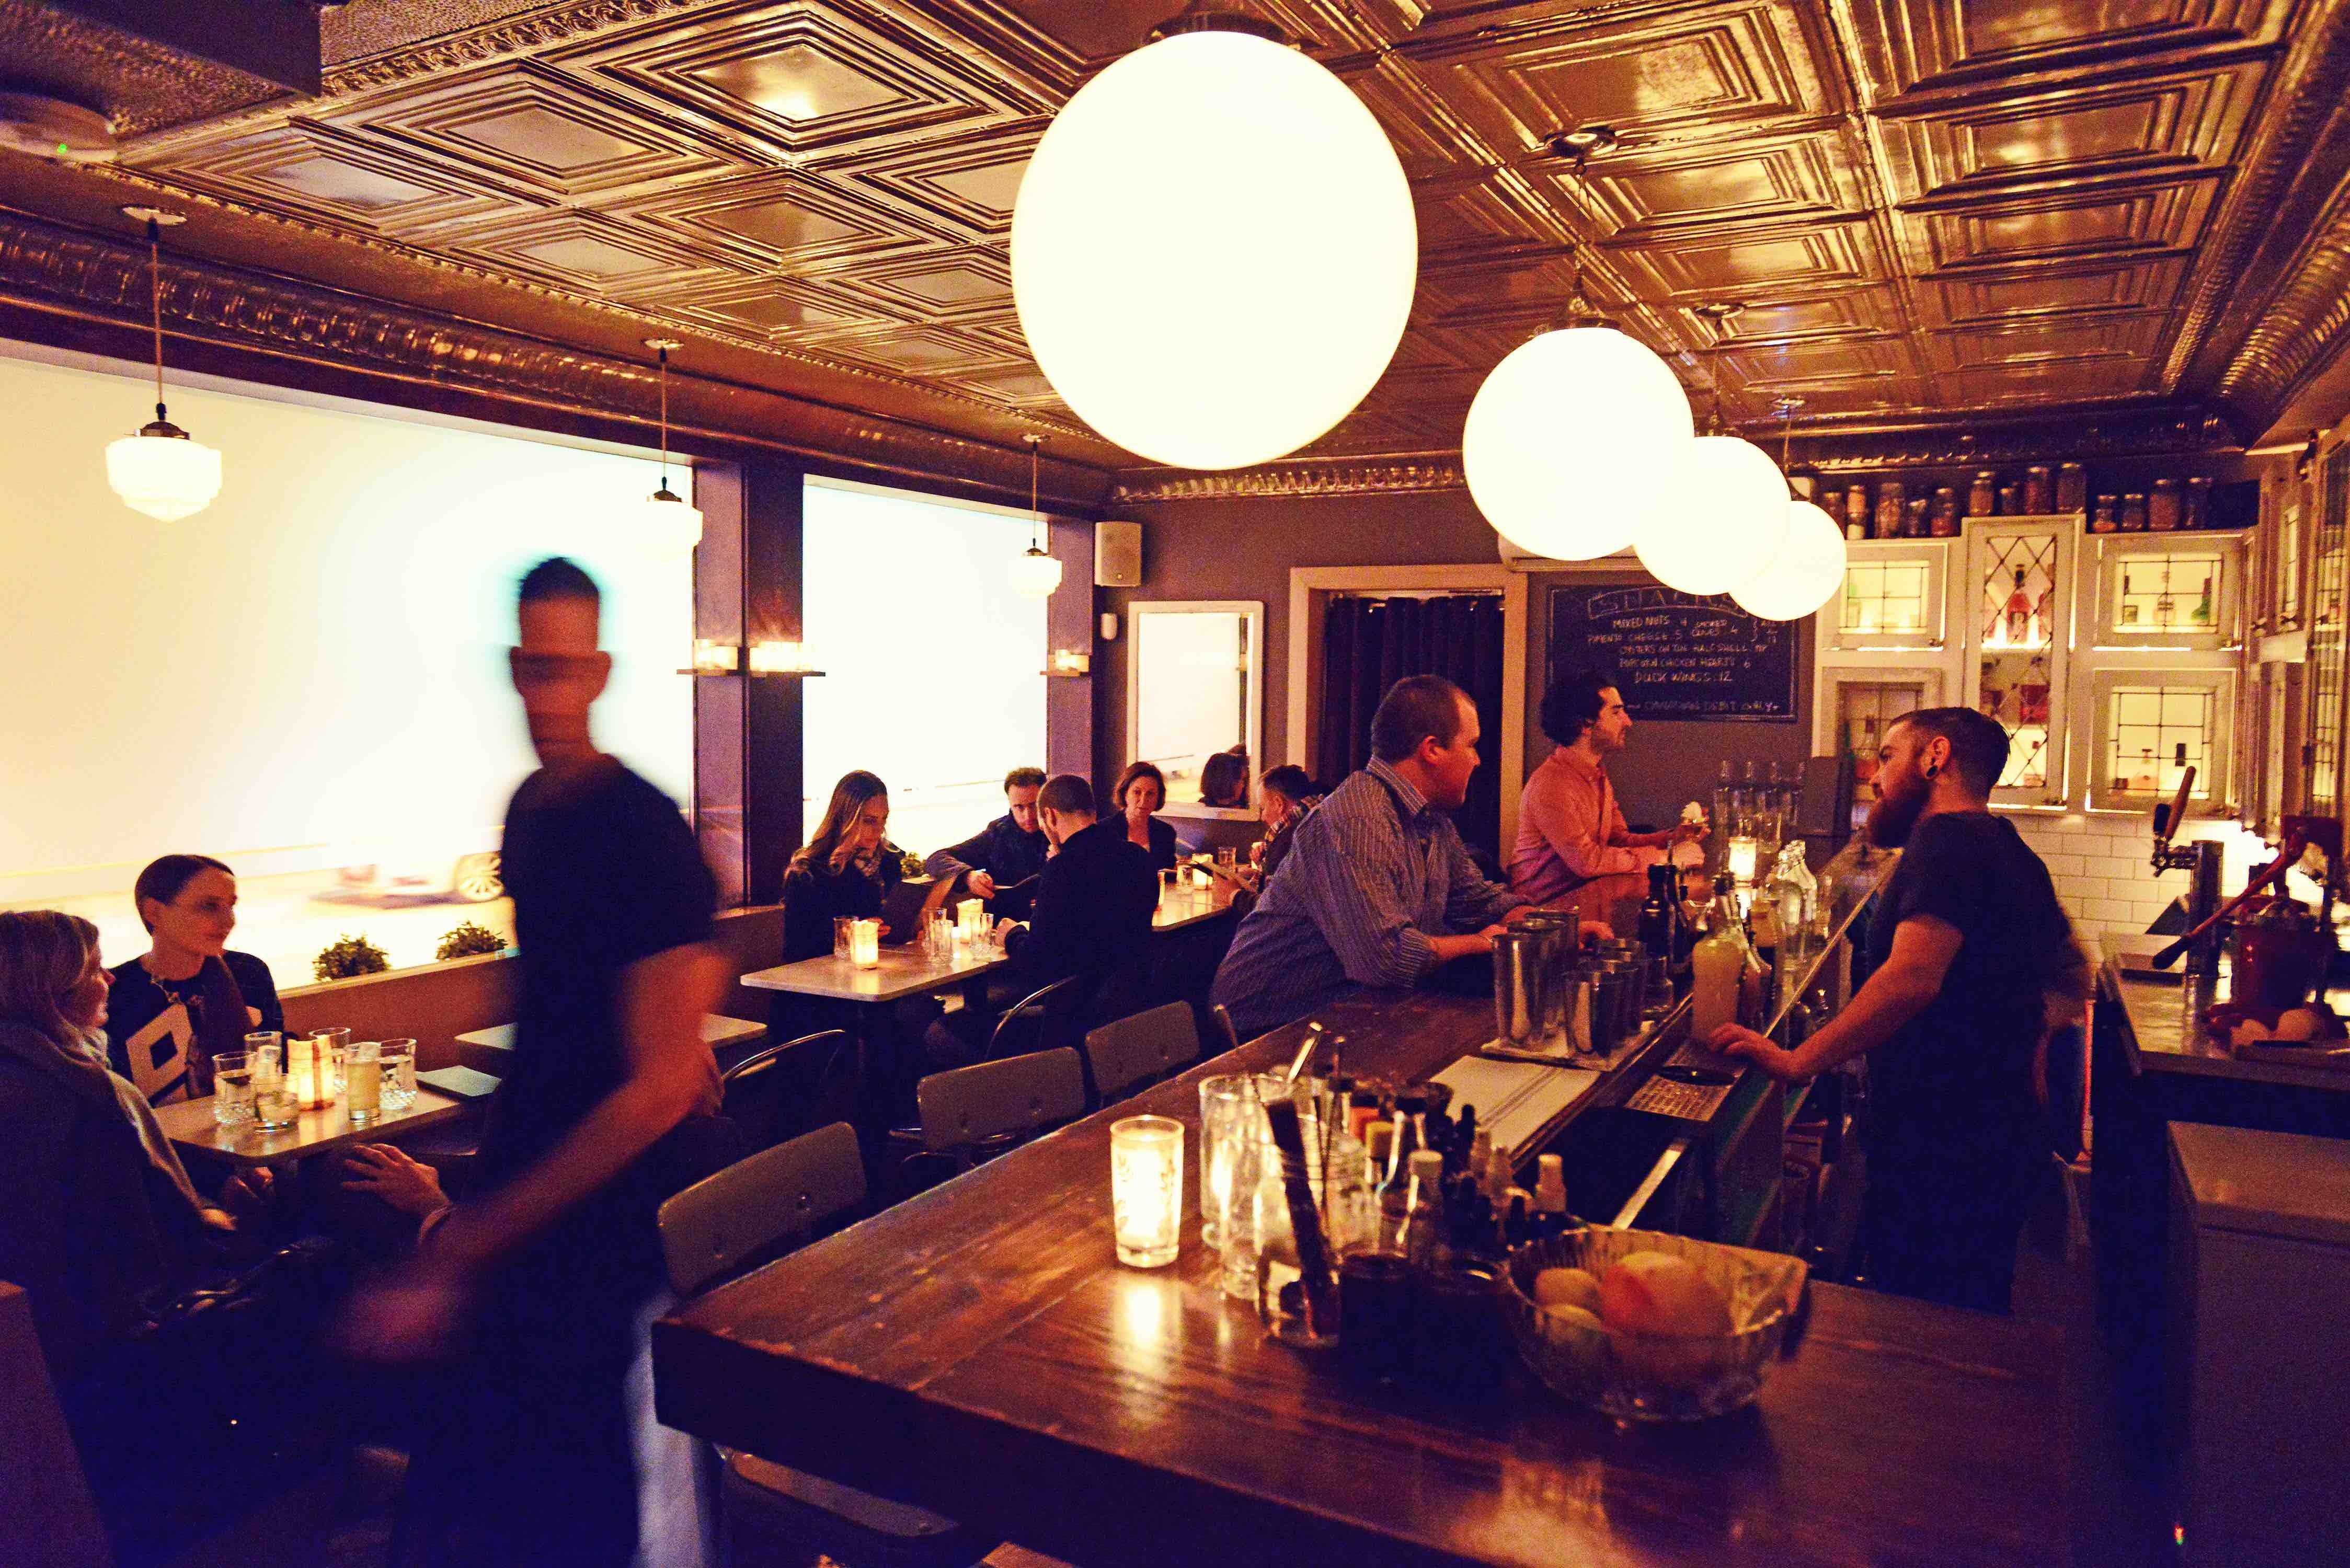 Toronto's Cocktail Bar